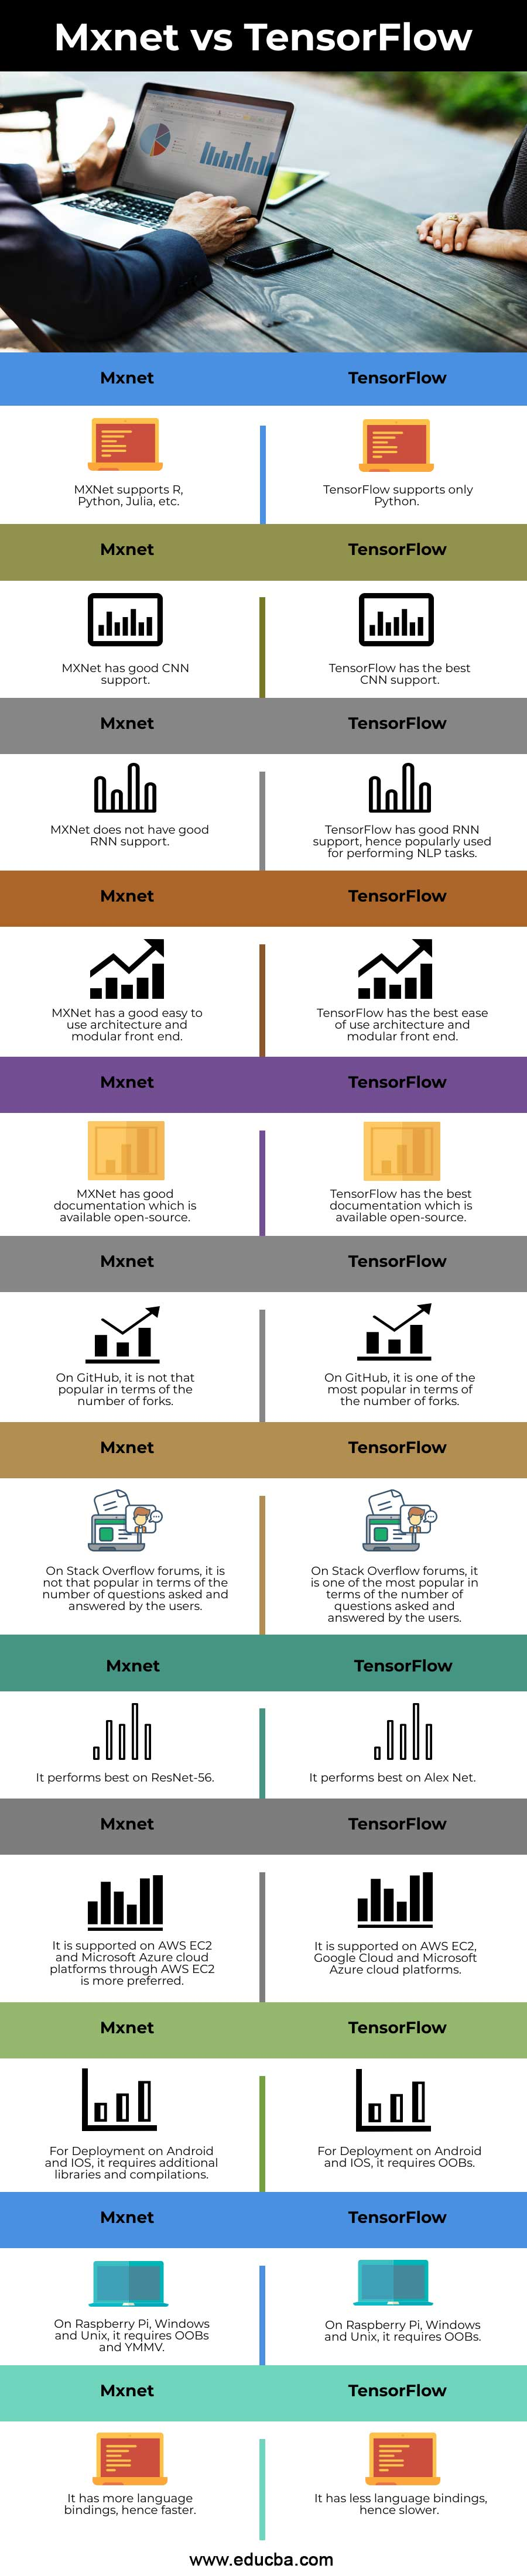 Mxnet vs TensorFlow info